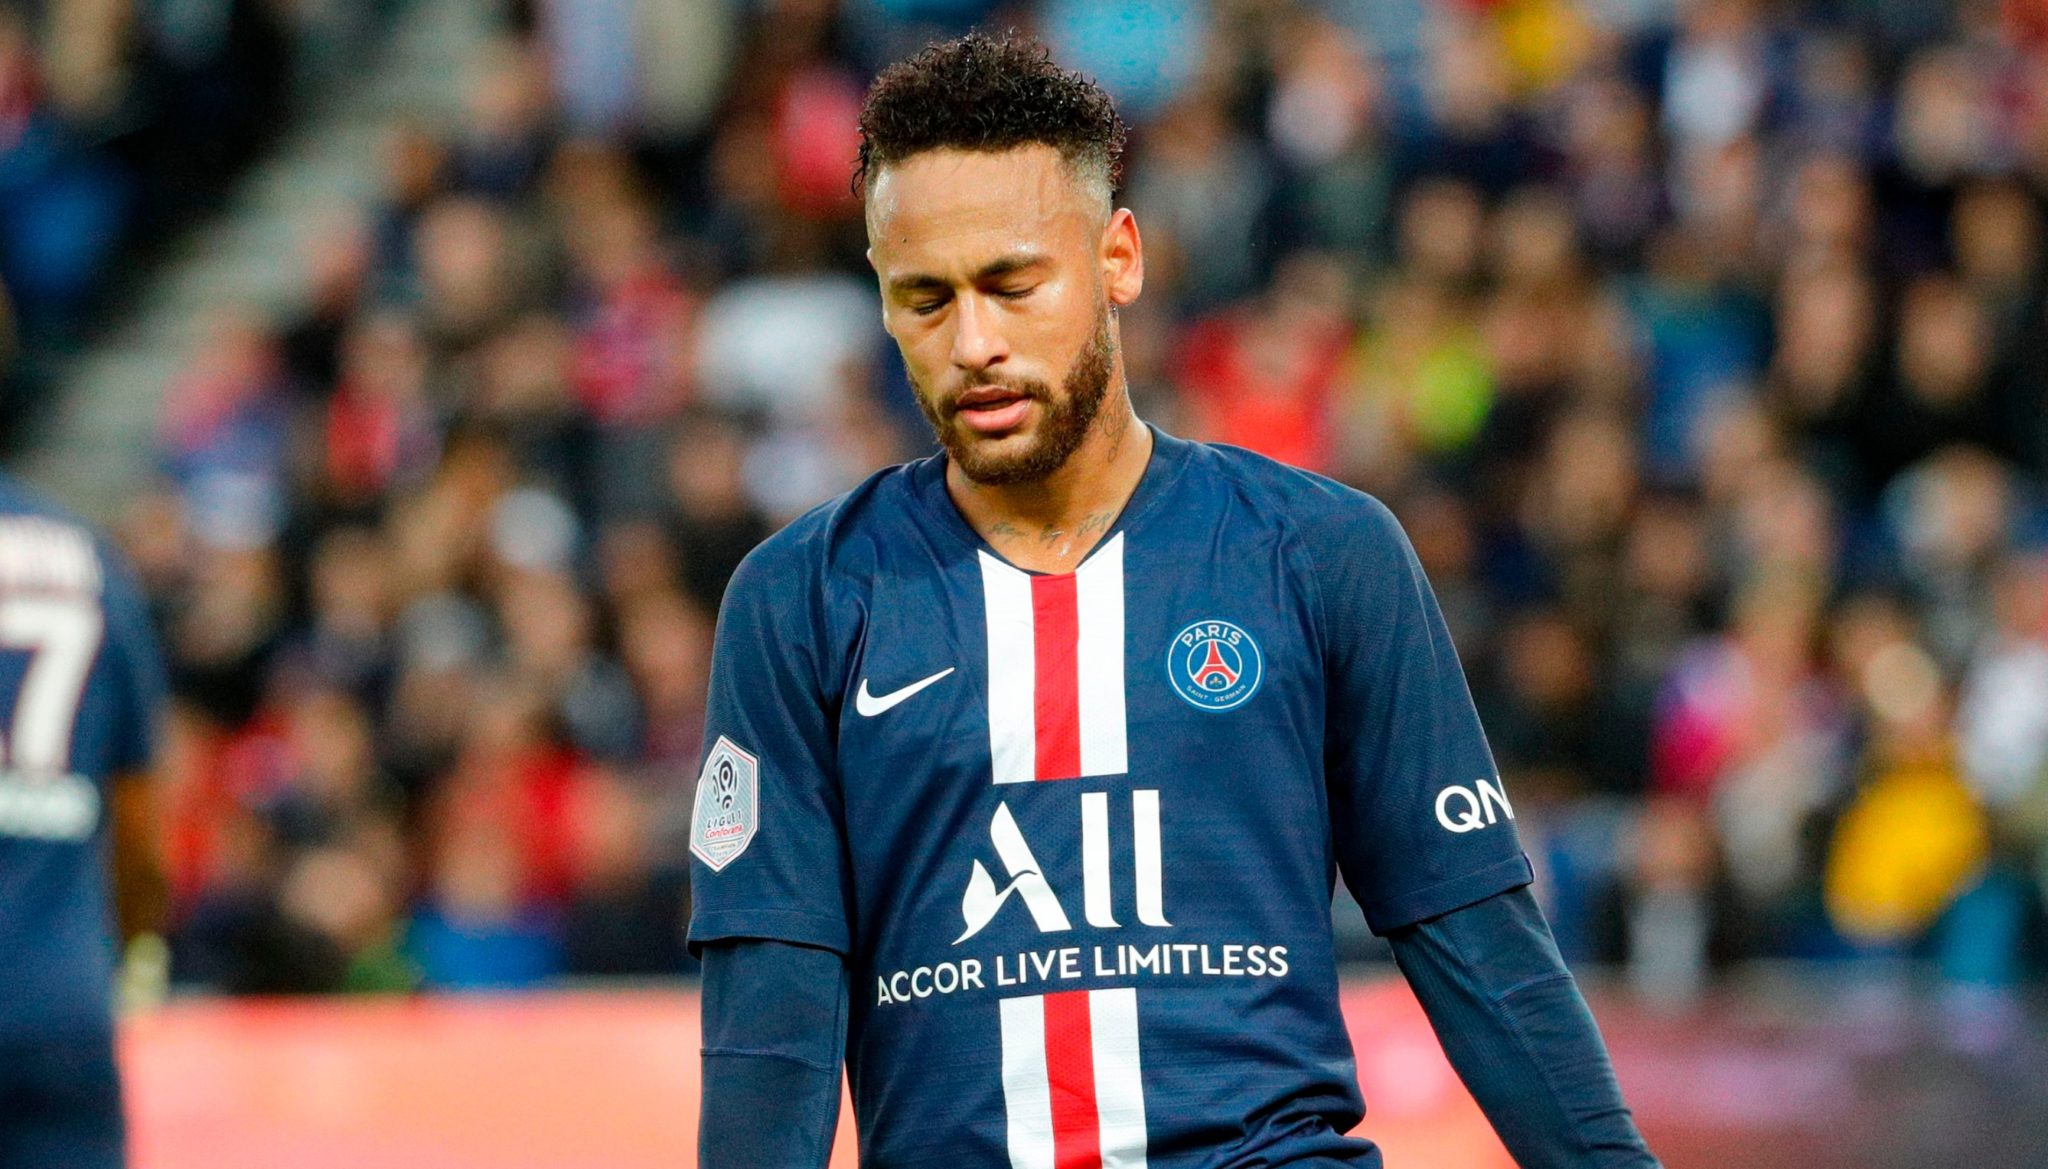 neymar2 - Neymar 'preparing legal battle' to quit PSG